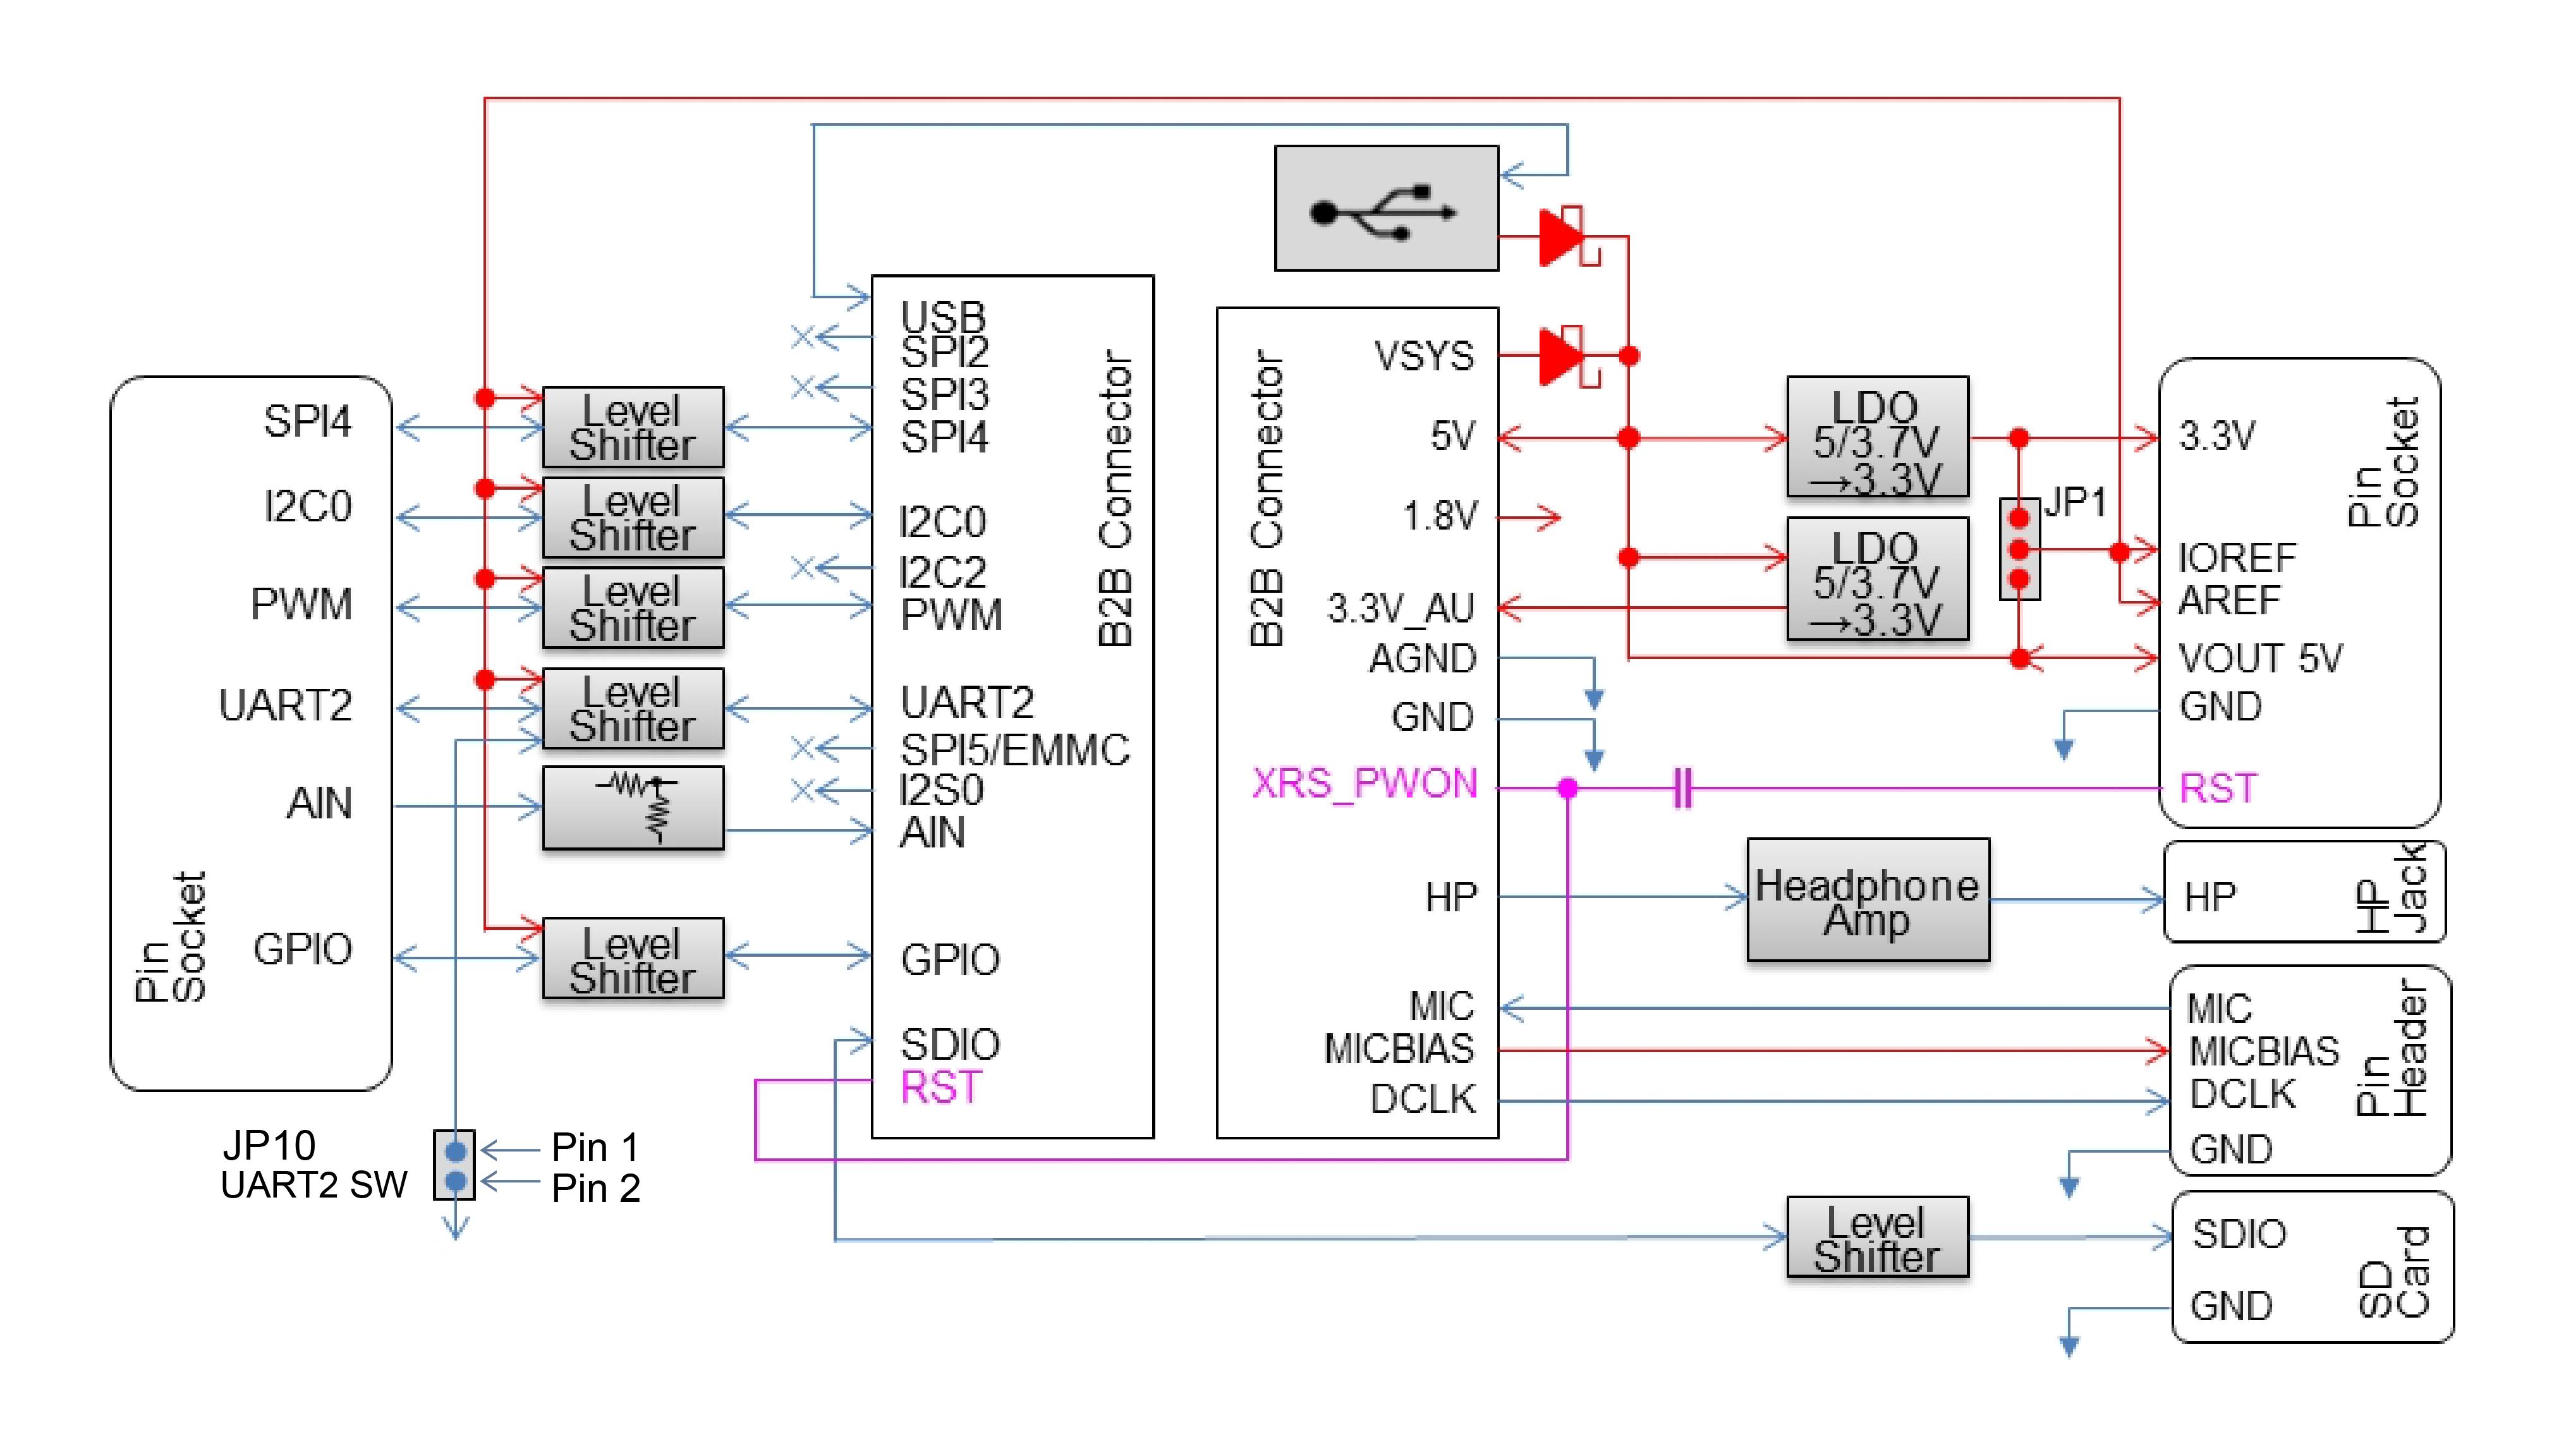 medium resolution of block diagram extboard